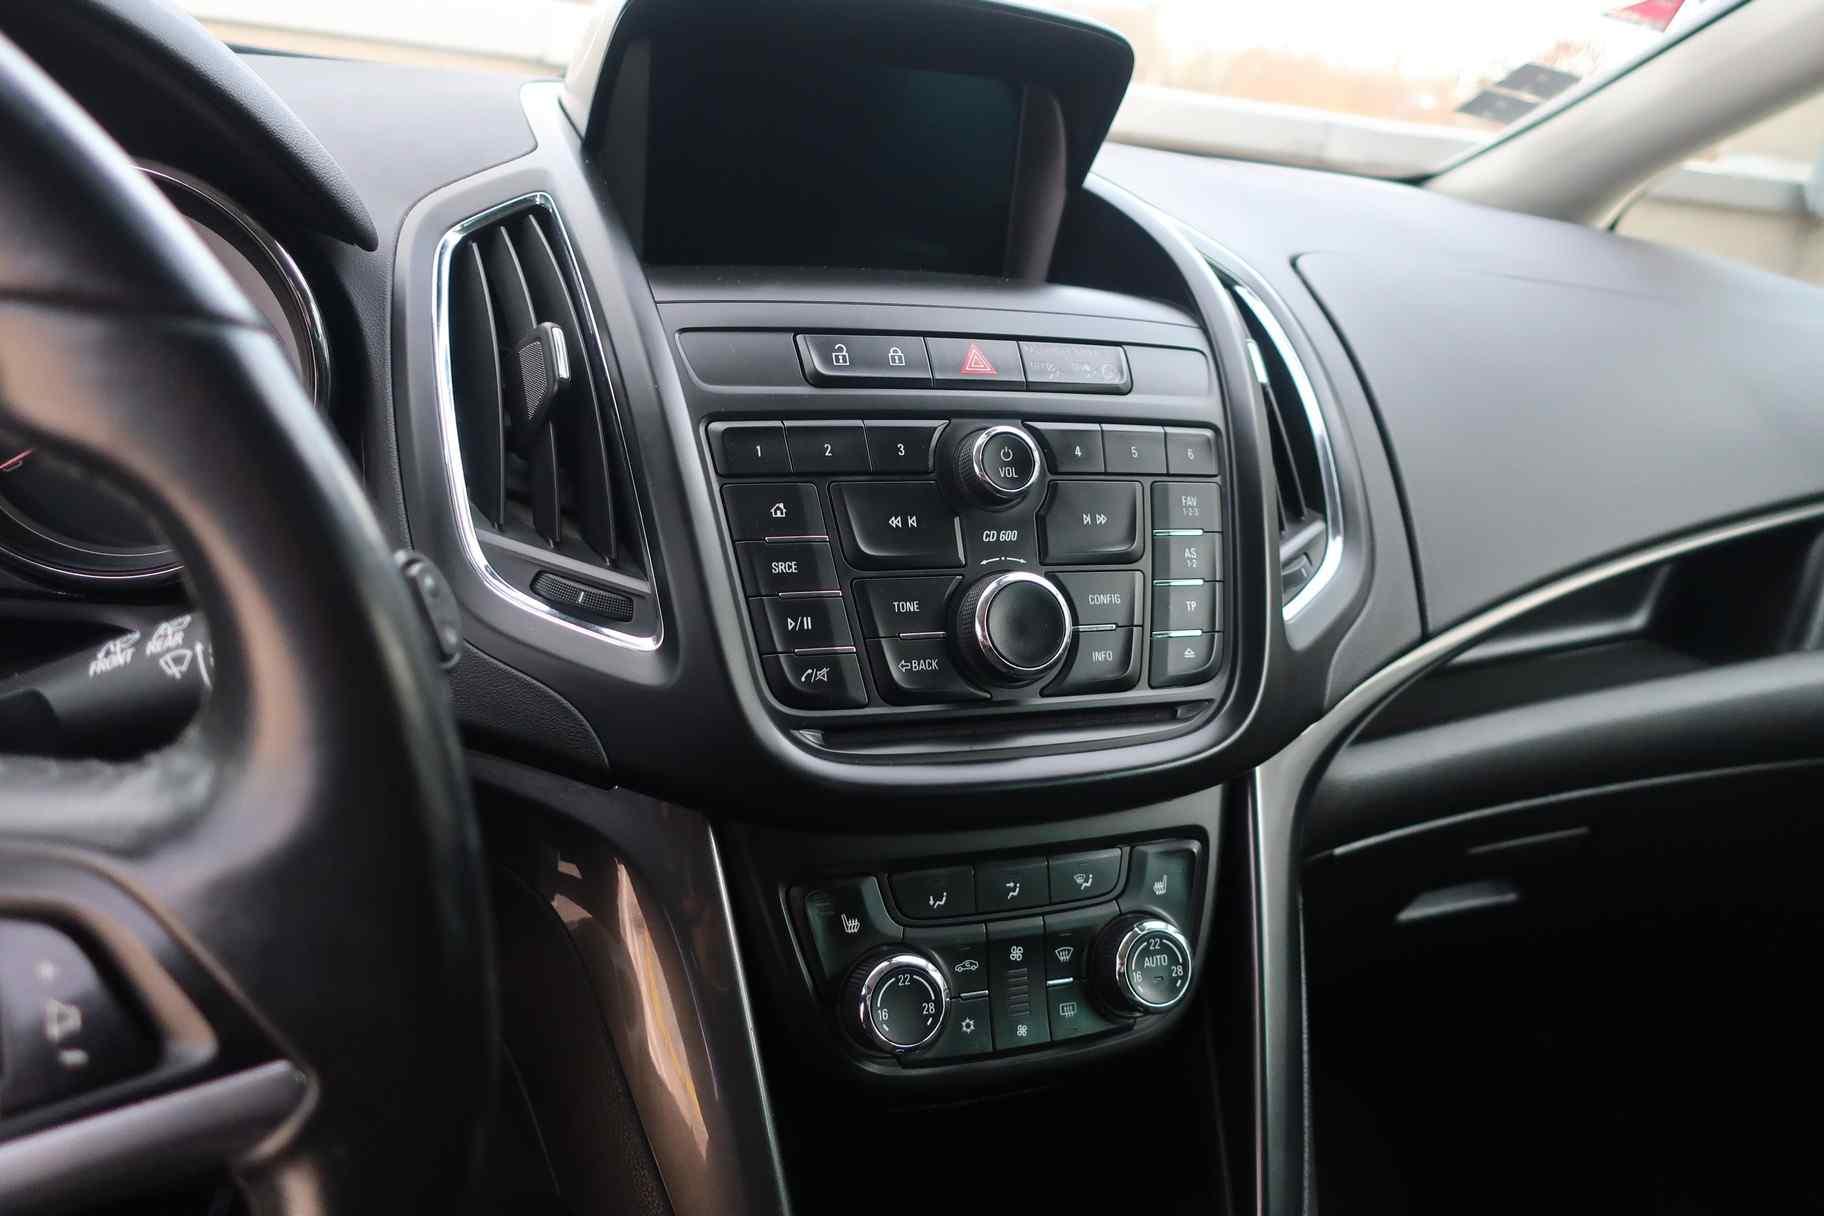 Opel Zafira Tourer 2.0 CDTI Cosmo AT